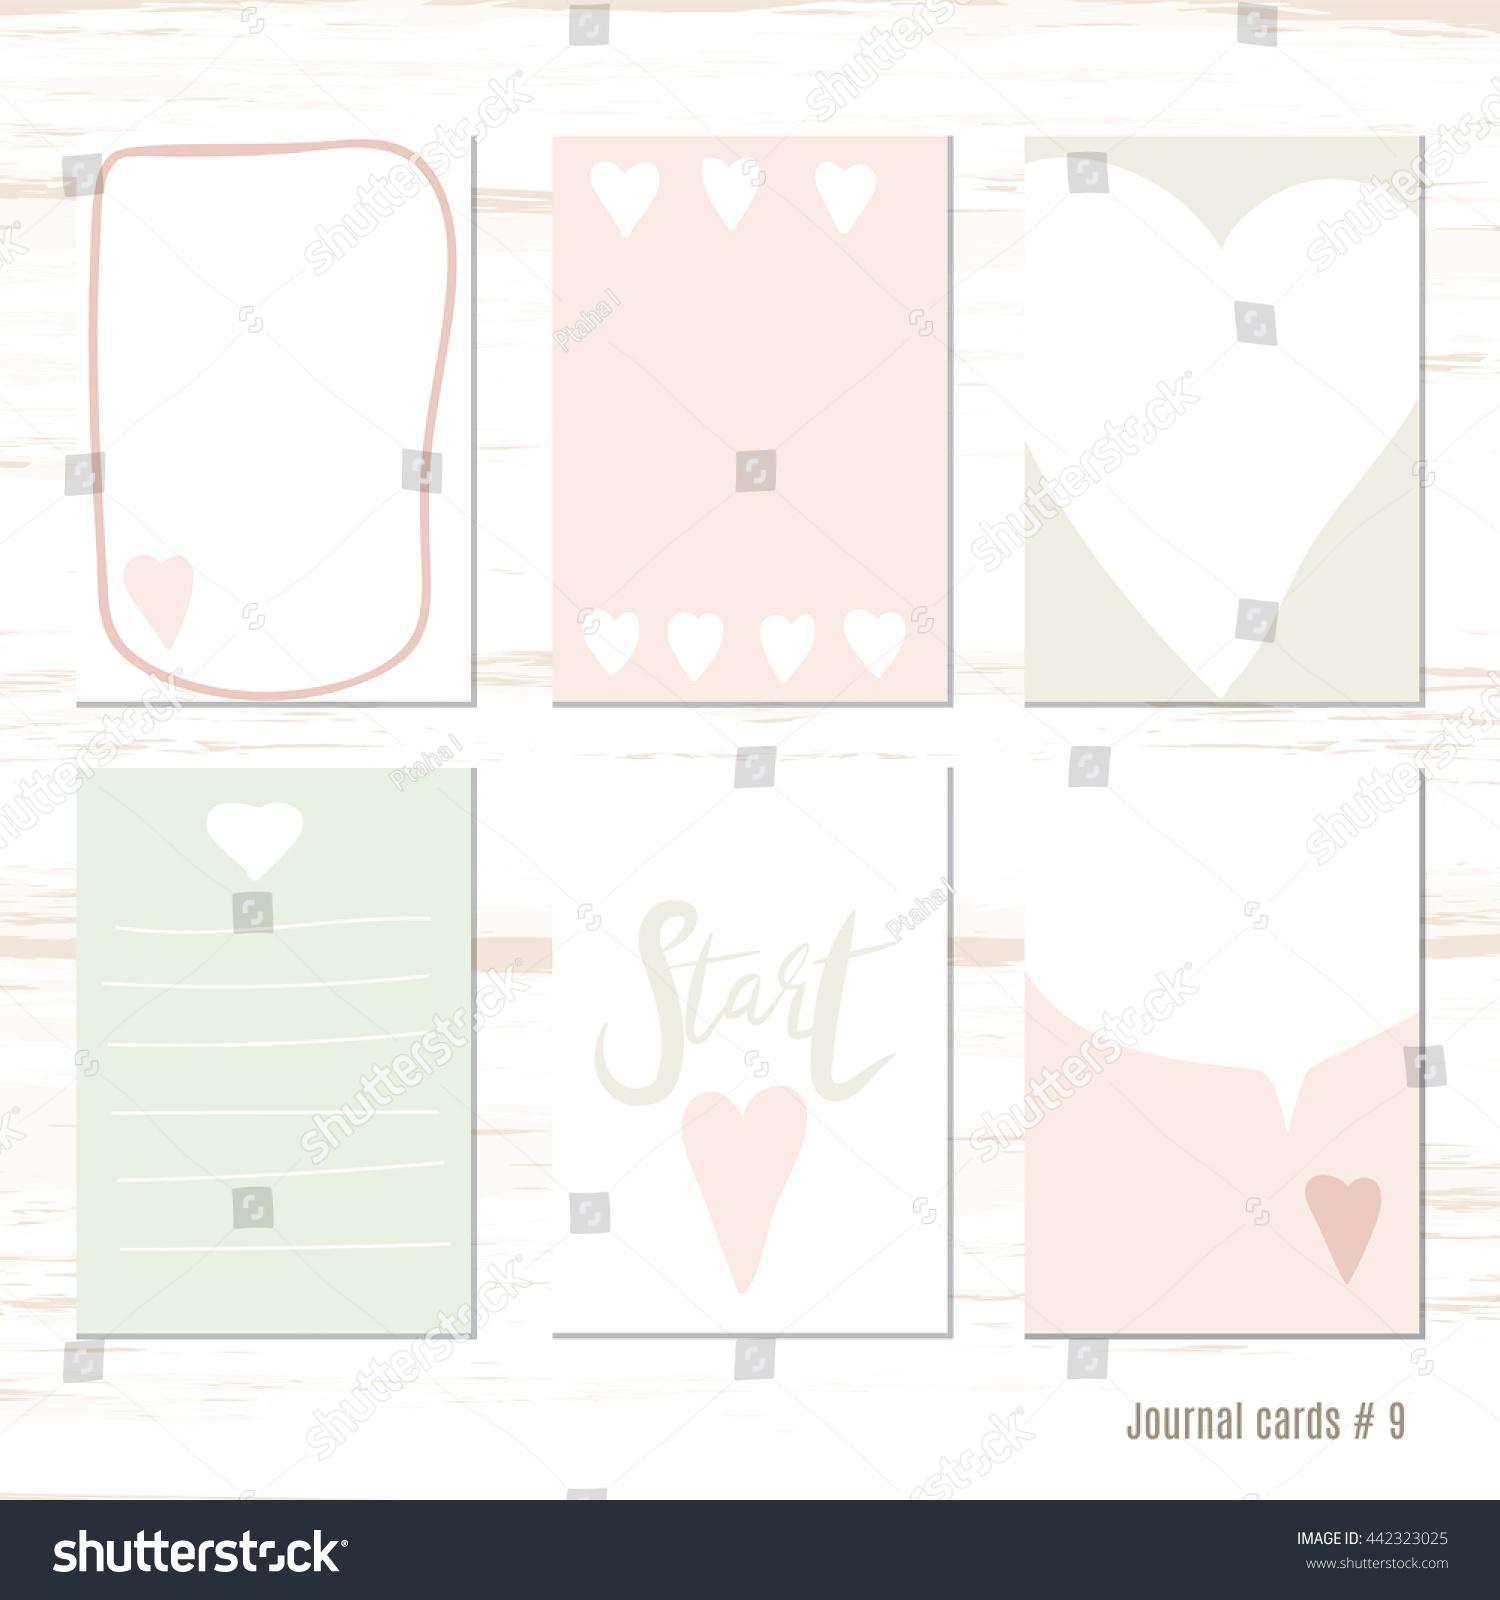 Vector Design Templates Journal Cards Scrapbooking Stock Photo ...